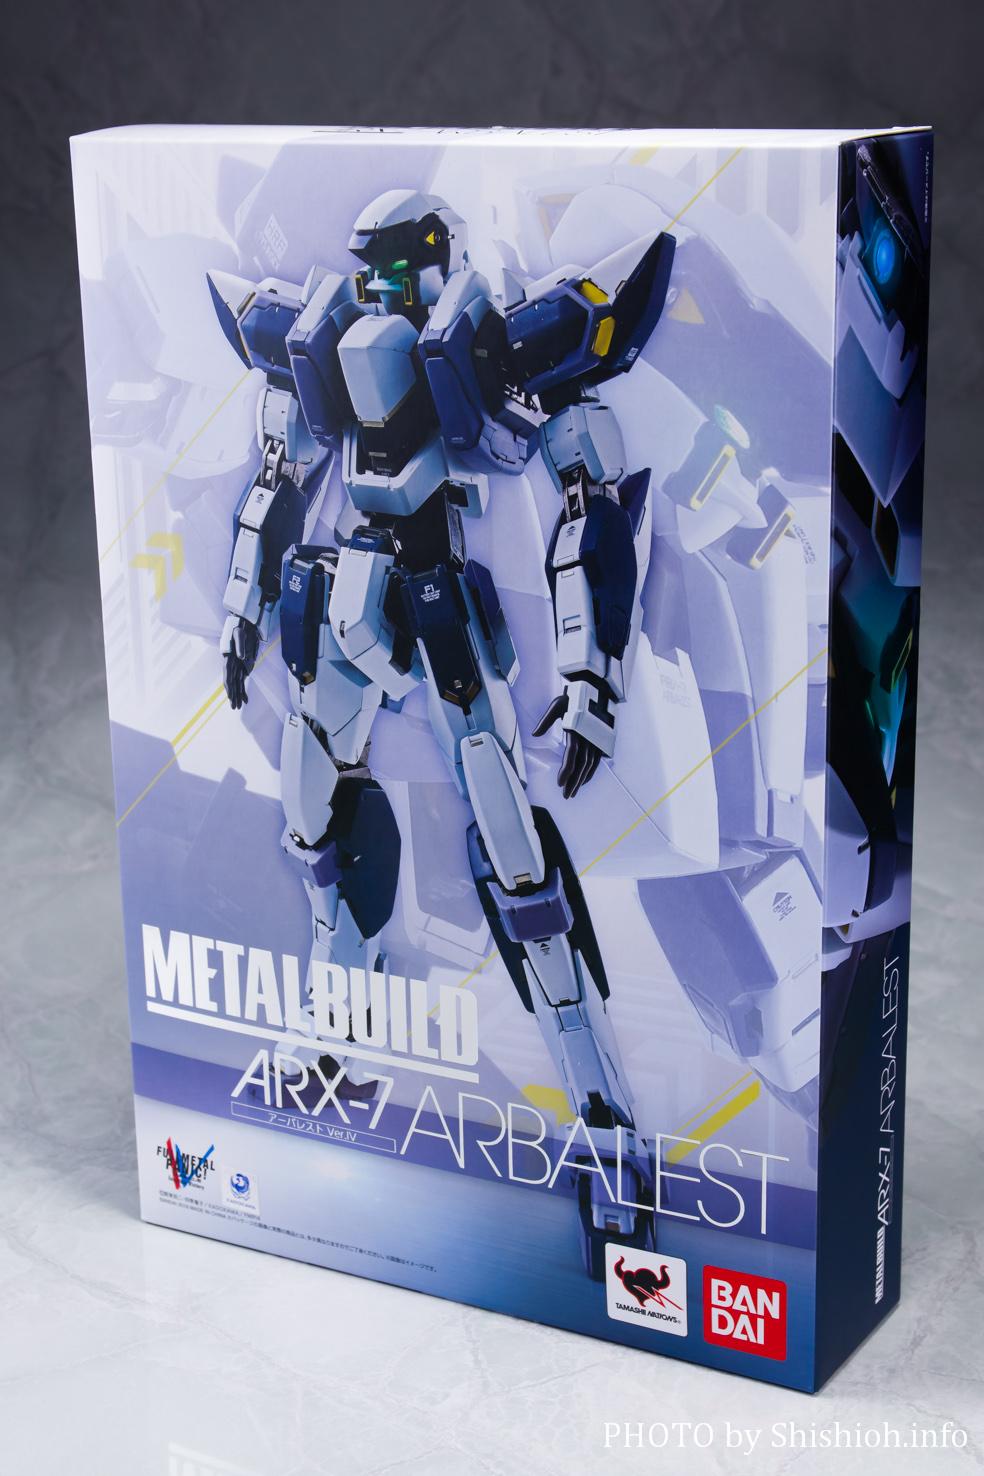 METAL BUILD アーバレスト Ver.IV